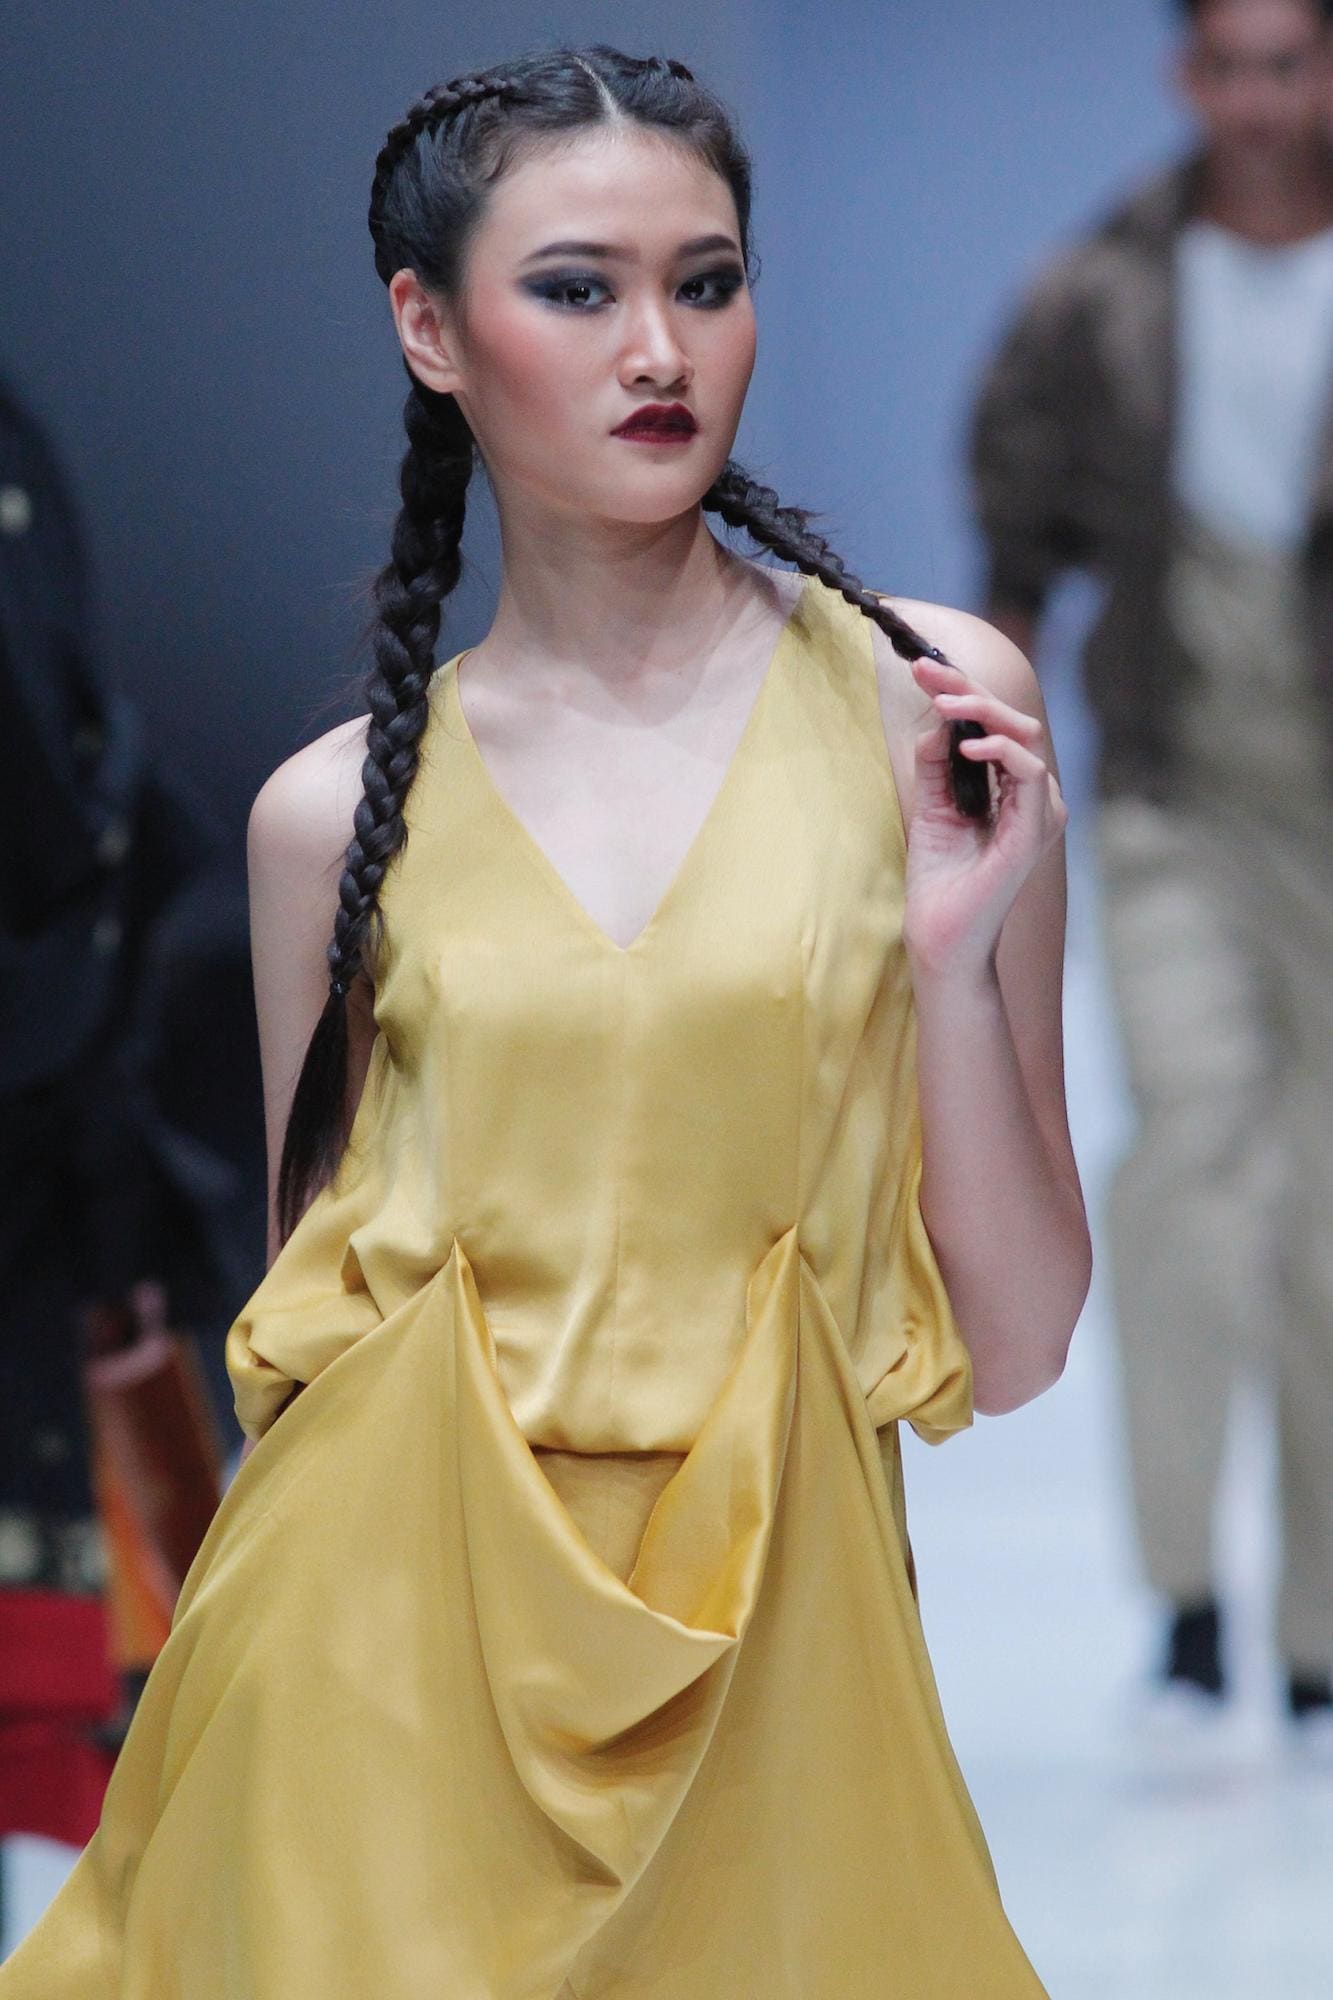 Wanita asia dengan rambut boxer braid dikepang warna hitam – Jakarta Fashion Week 2019